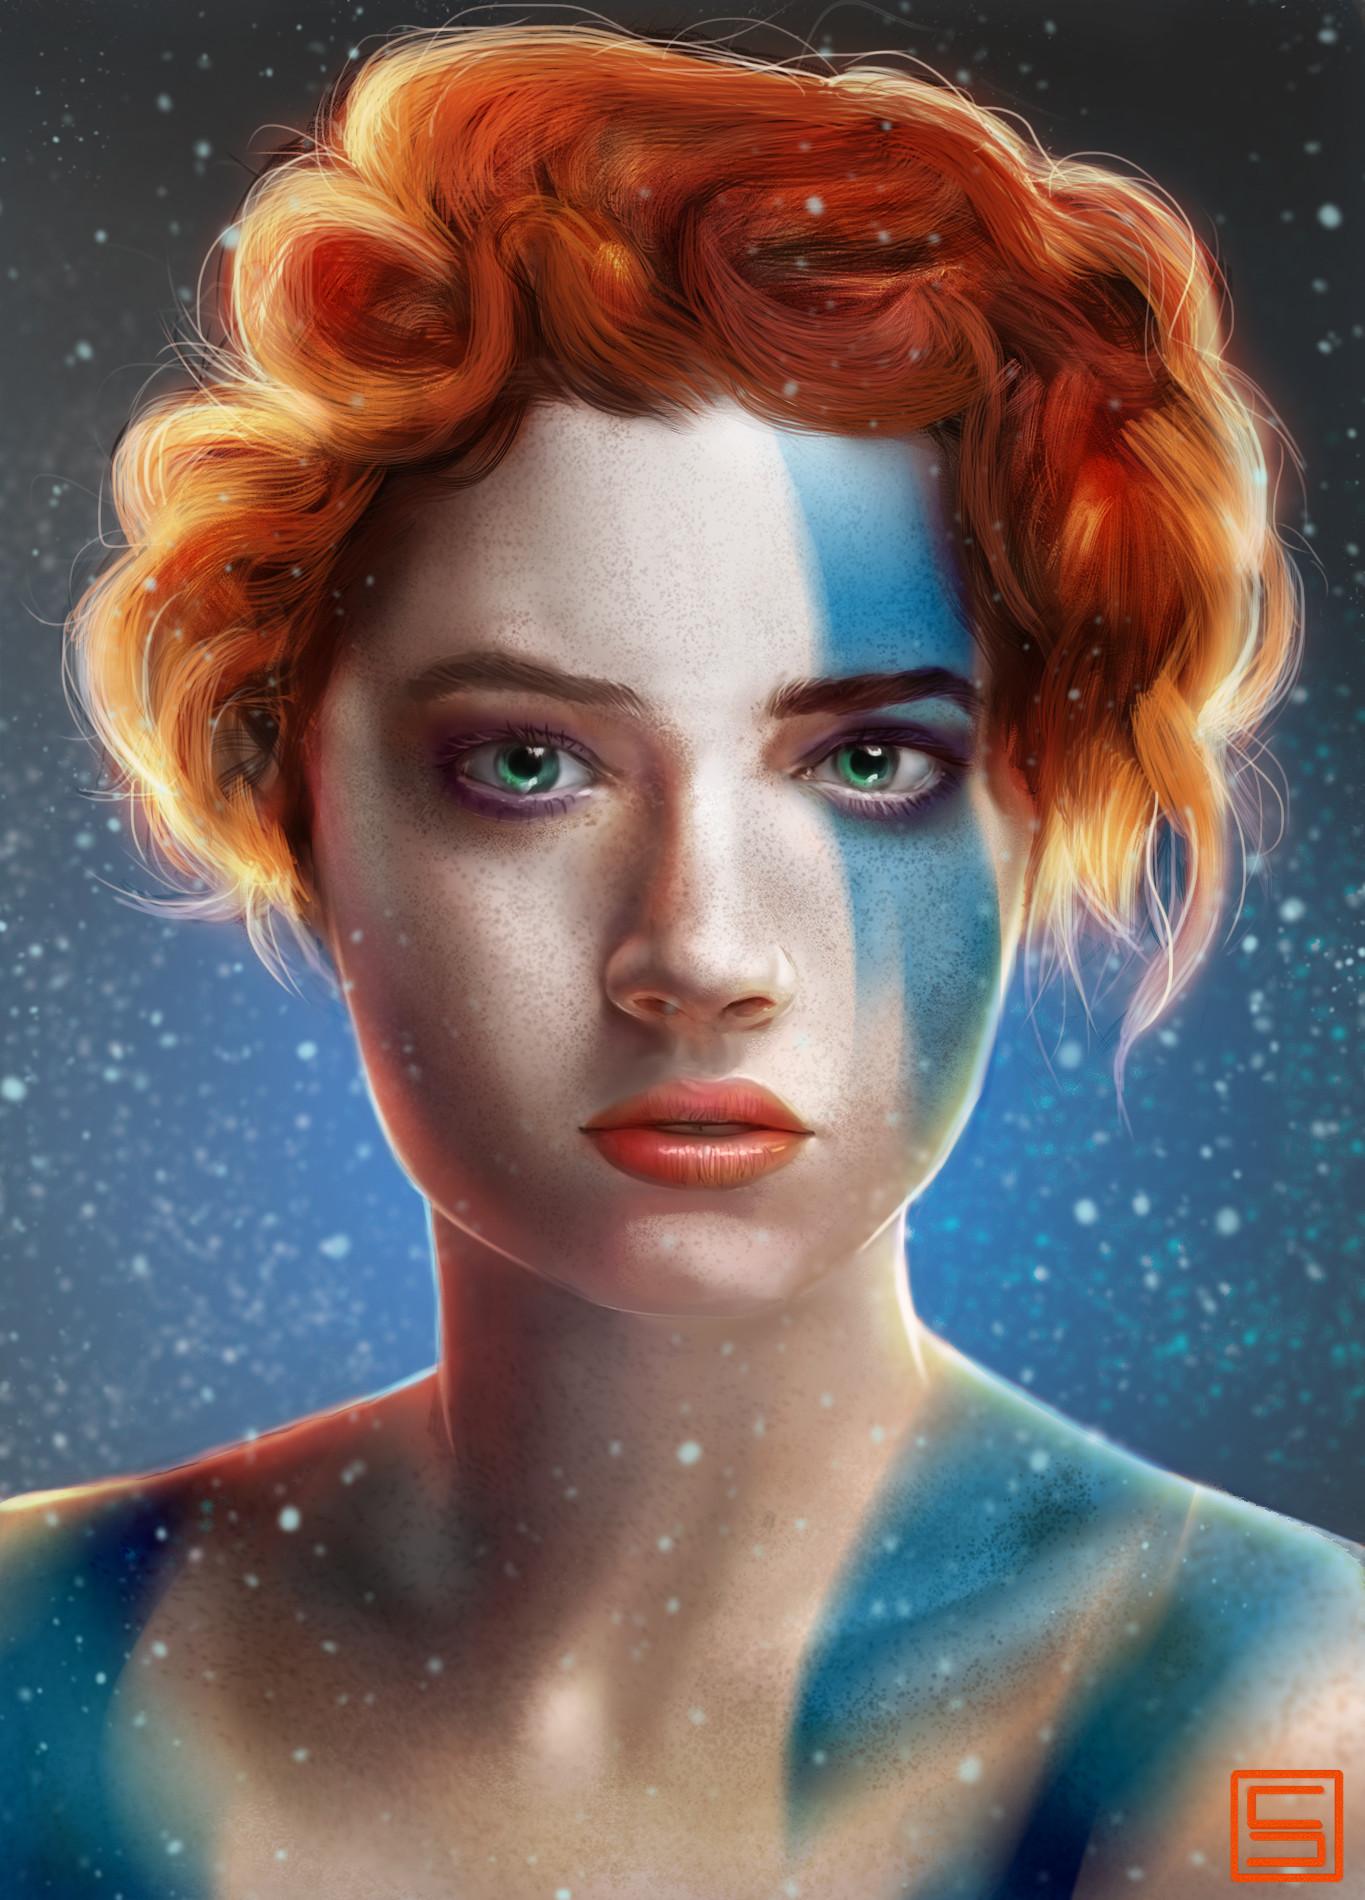 Sergio palomino portrait study vikinggirl bylo0b0o